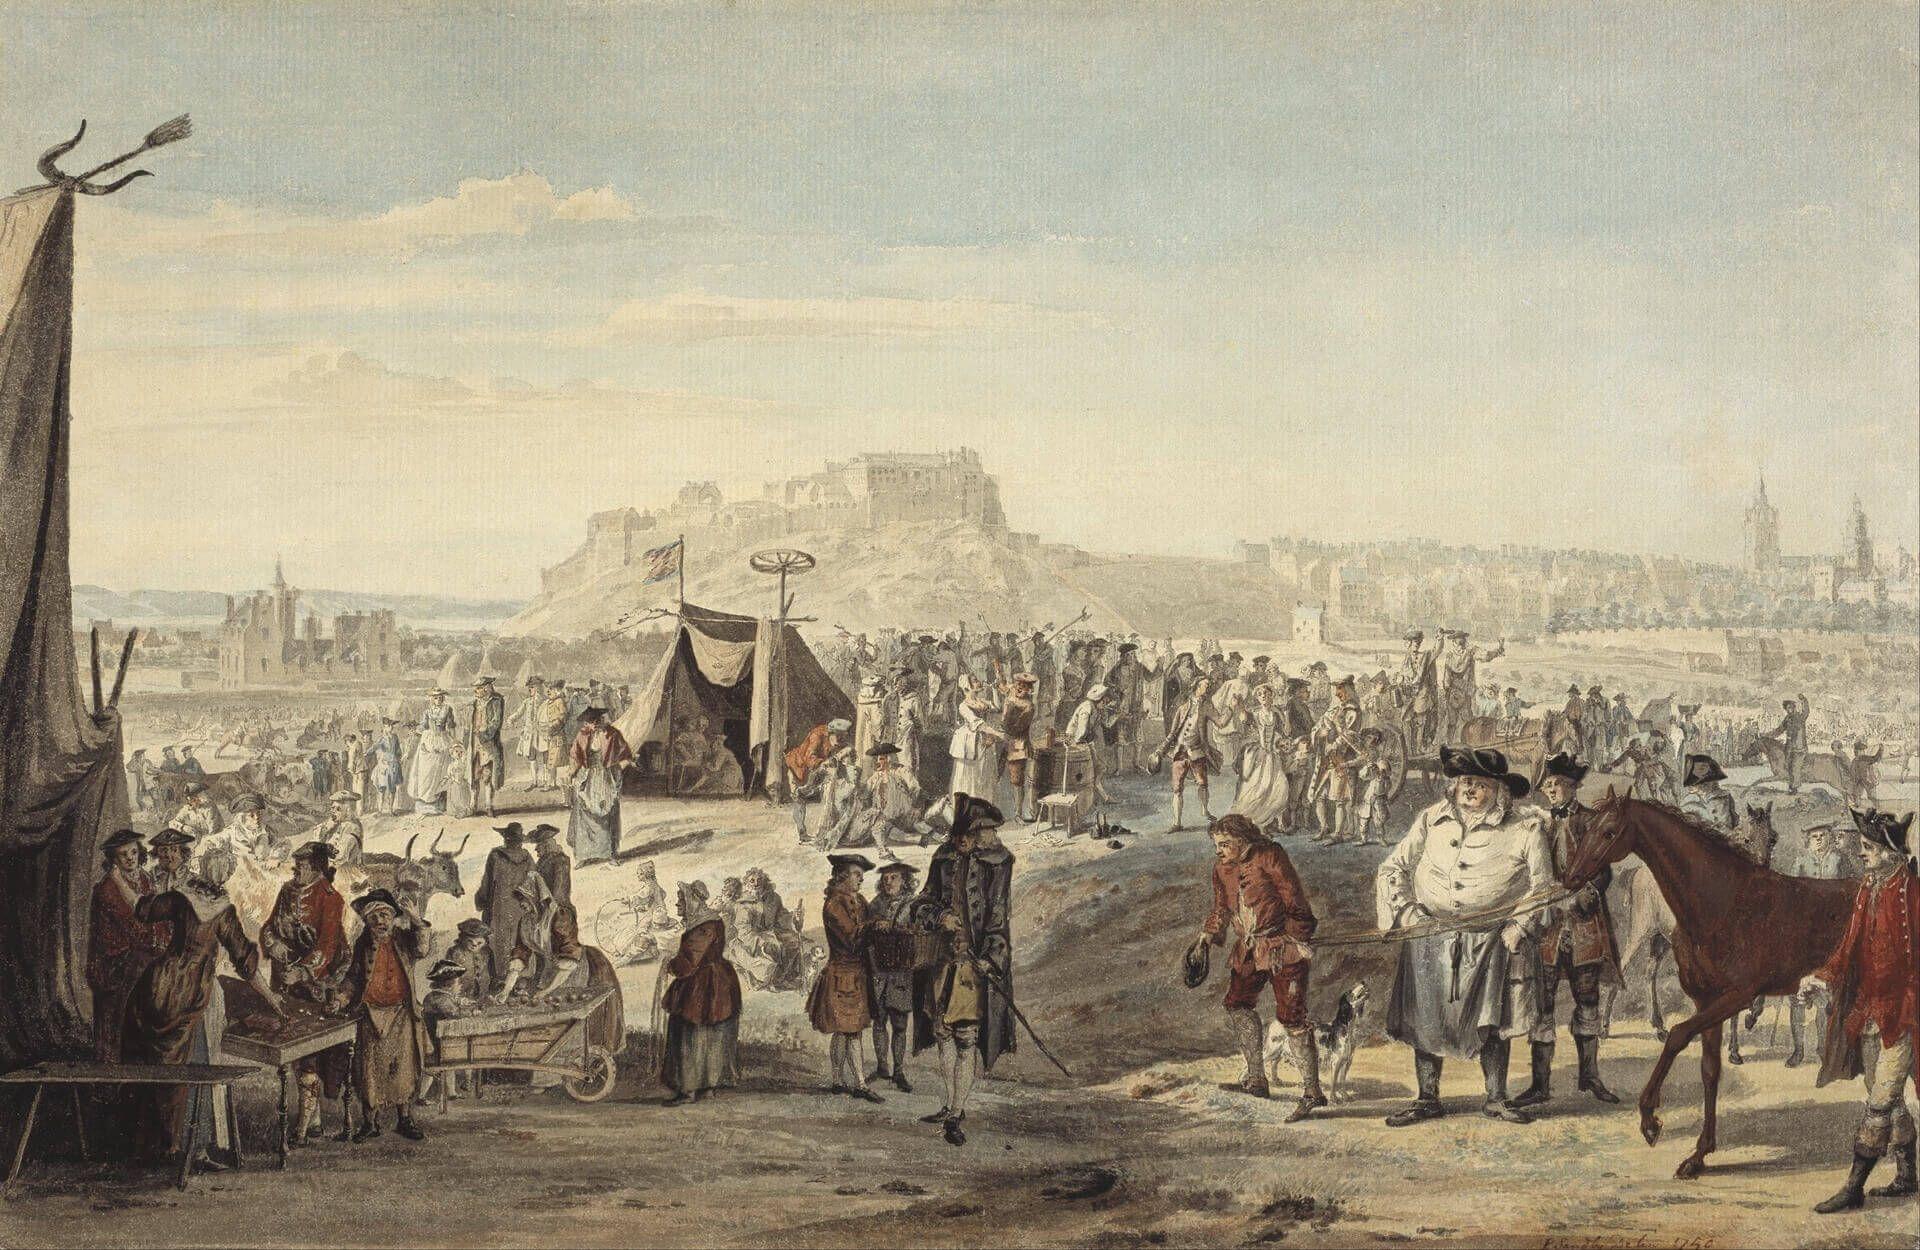 jacobitismo nacionalismo escocés Feria de caballos en Bruntsfield, Edimburgo